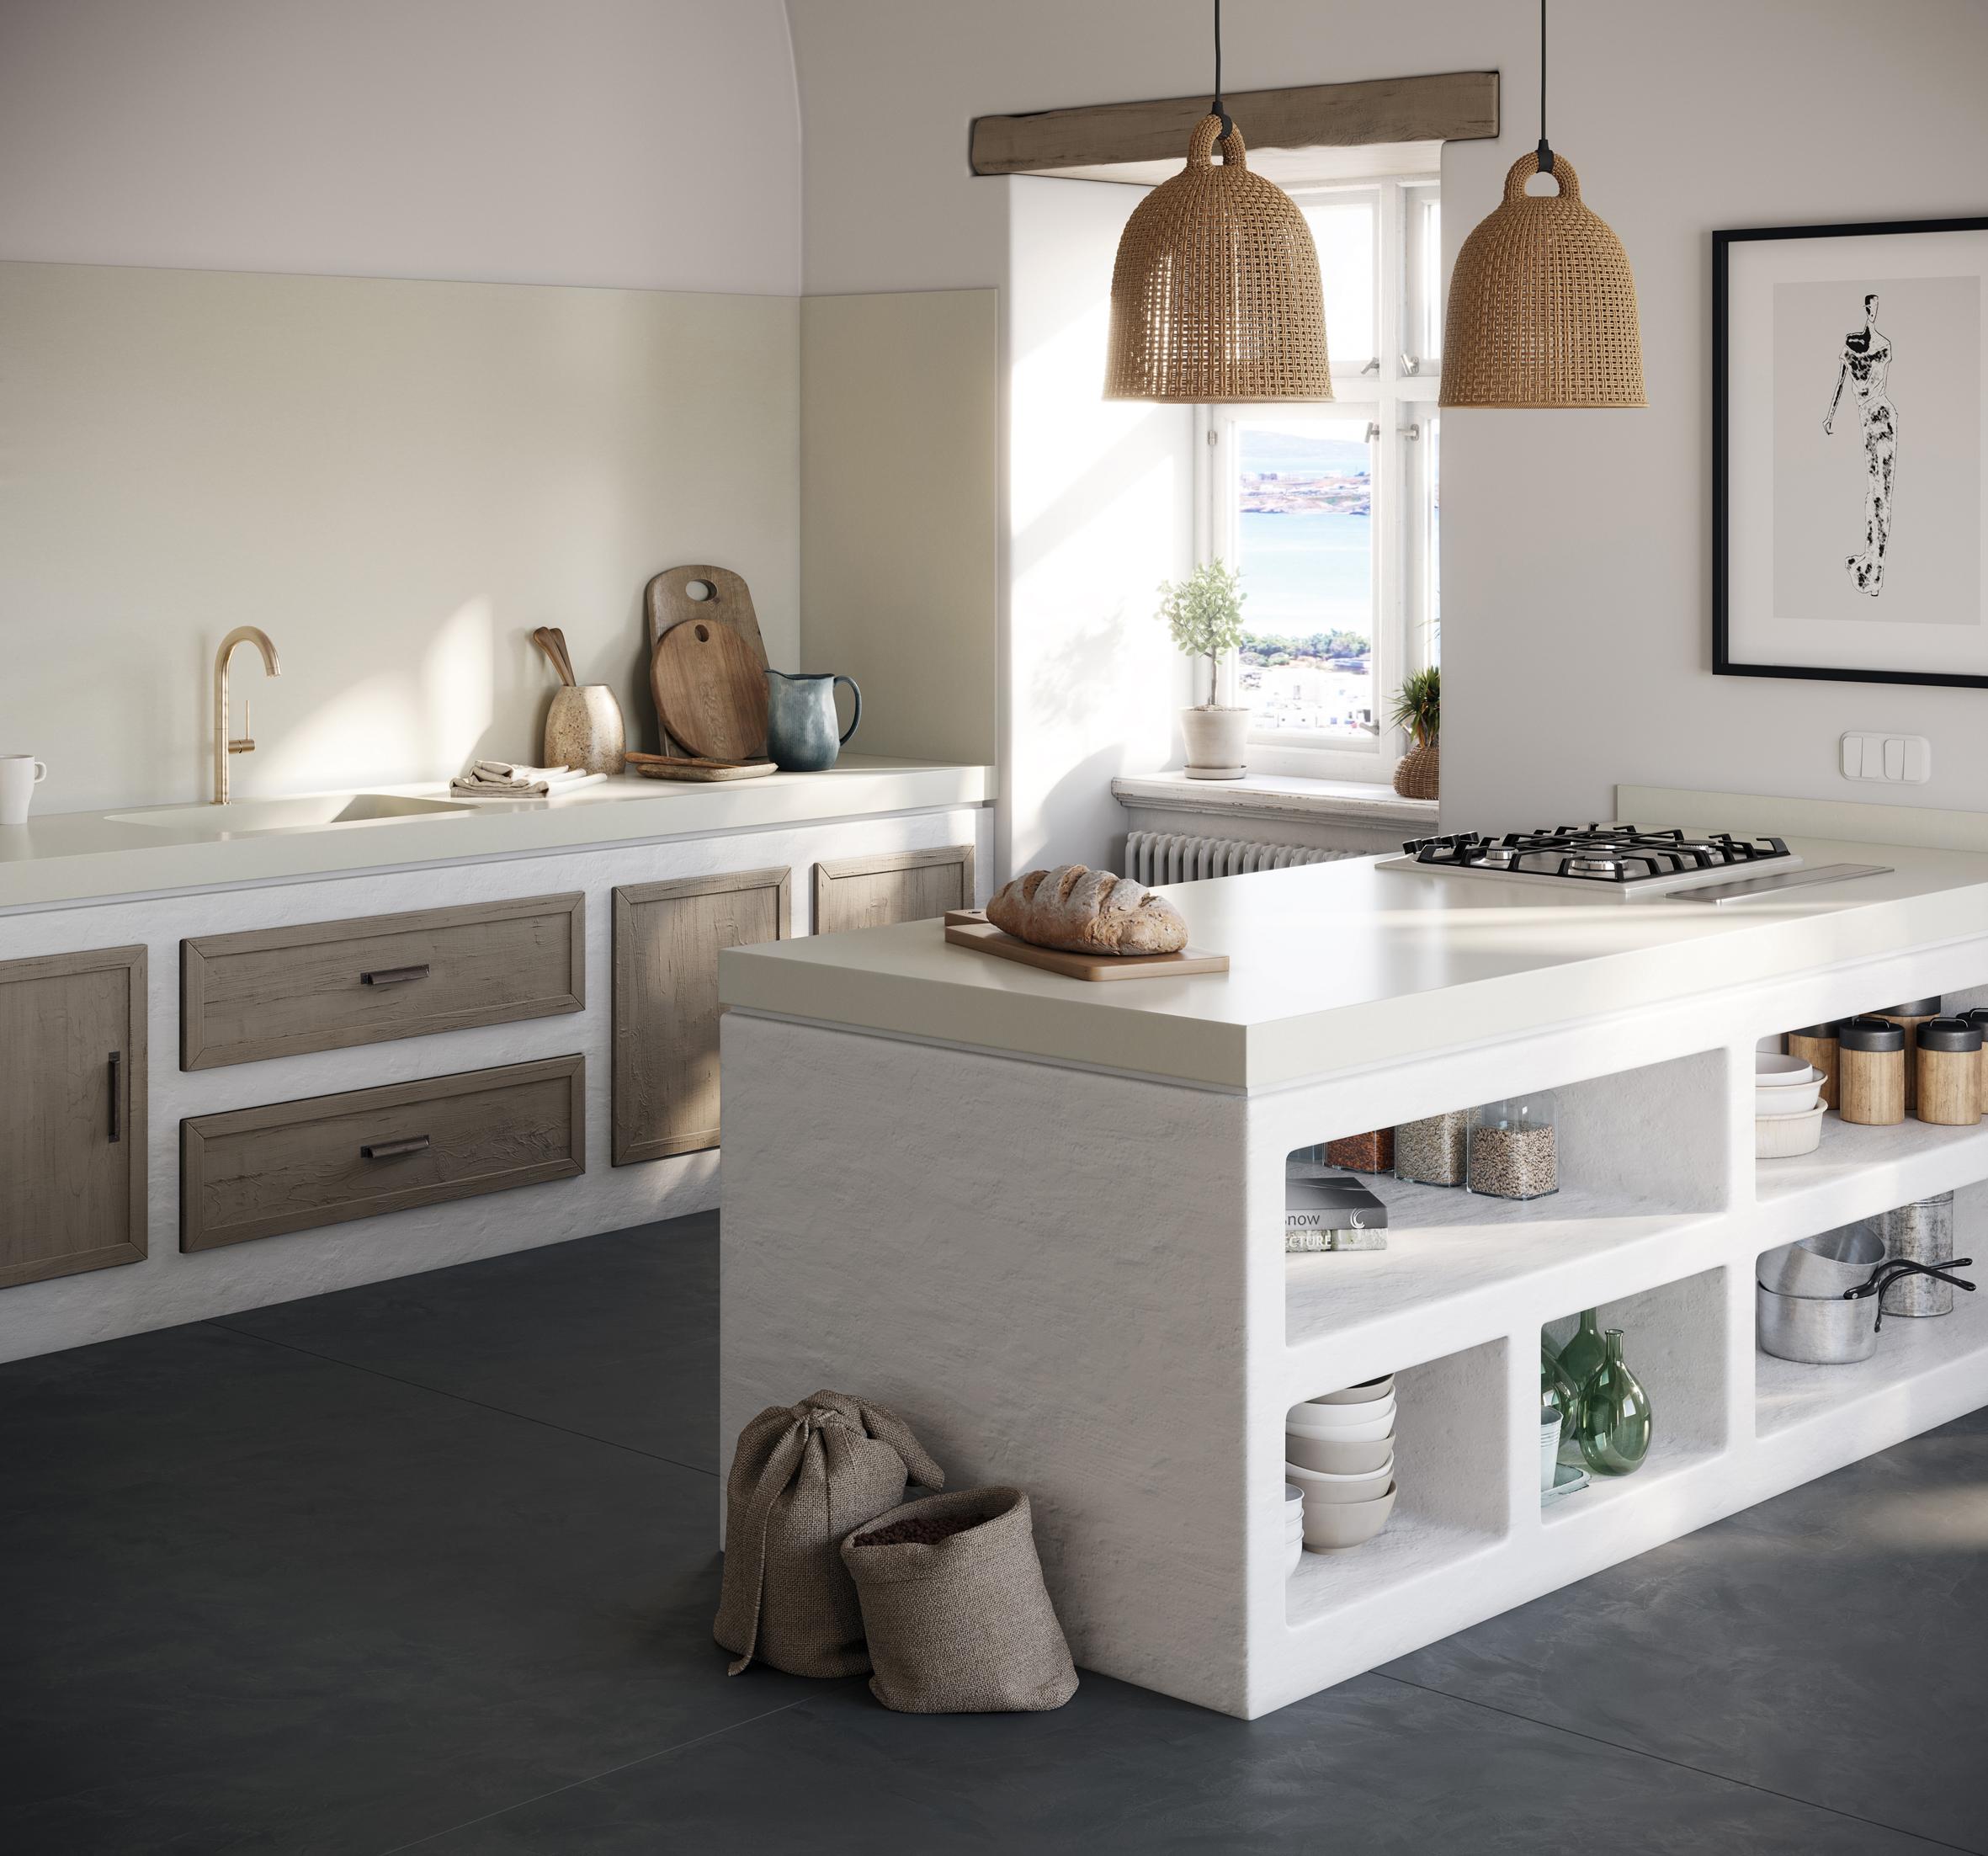 Image of Silestone Sunlit Days Faro White Kitchen Lifestyle in Cosentino Awarded Gold Status by Supply Chain Sustainability School - Cosentino